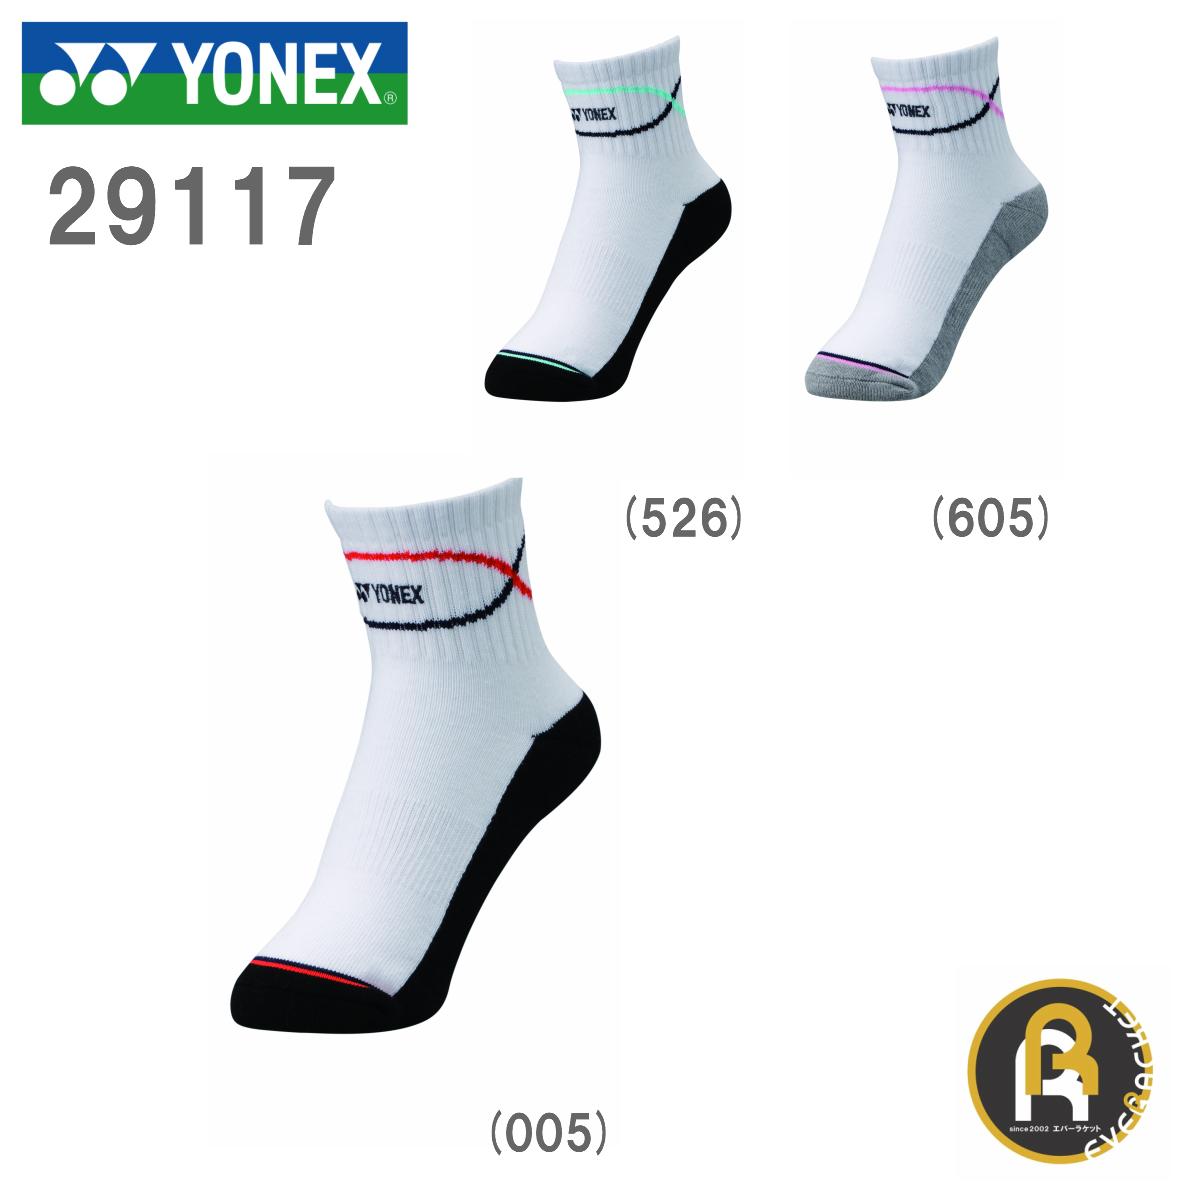 9ffaadc60ff7bc YONEX:レディースソックス ヨネックス ソックス ウィメンズアンクル ...